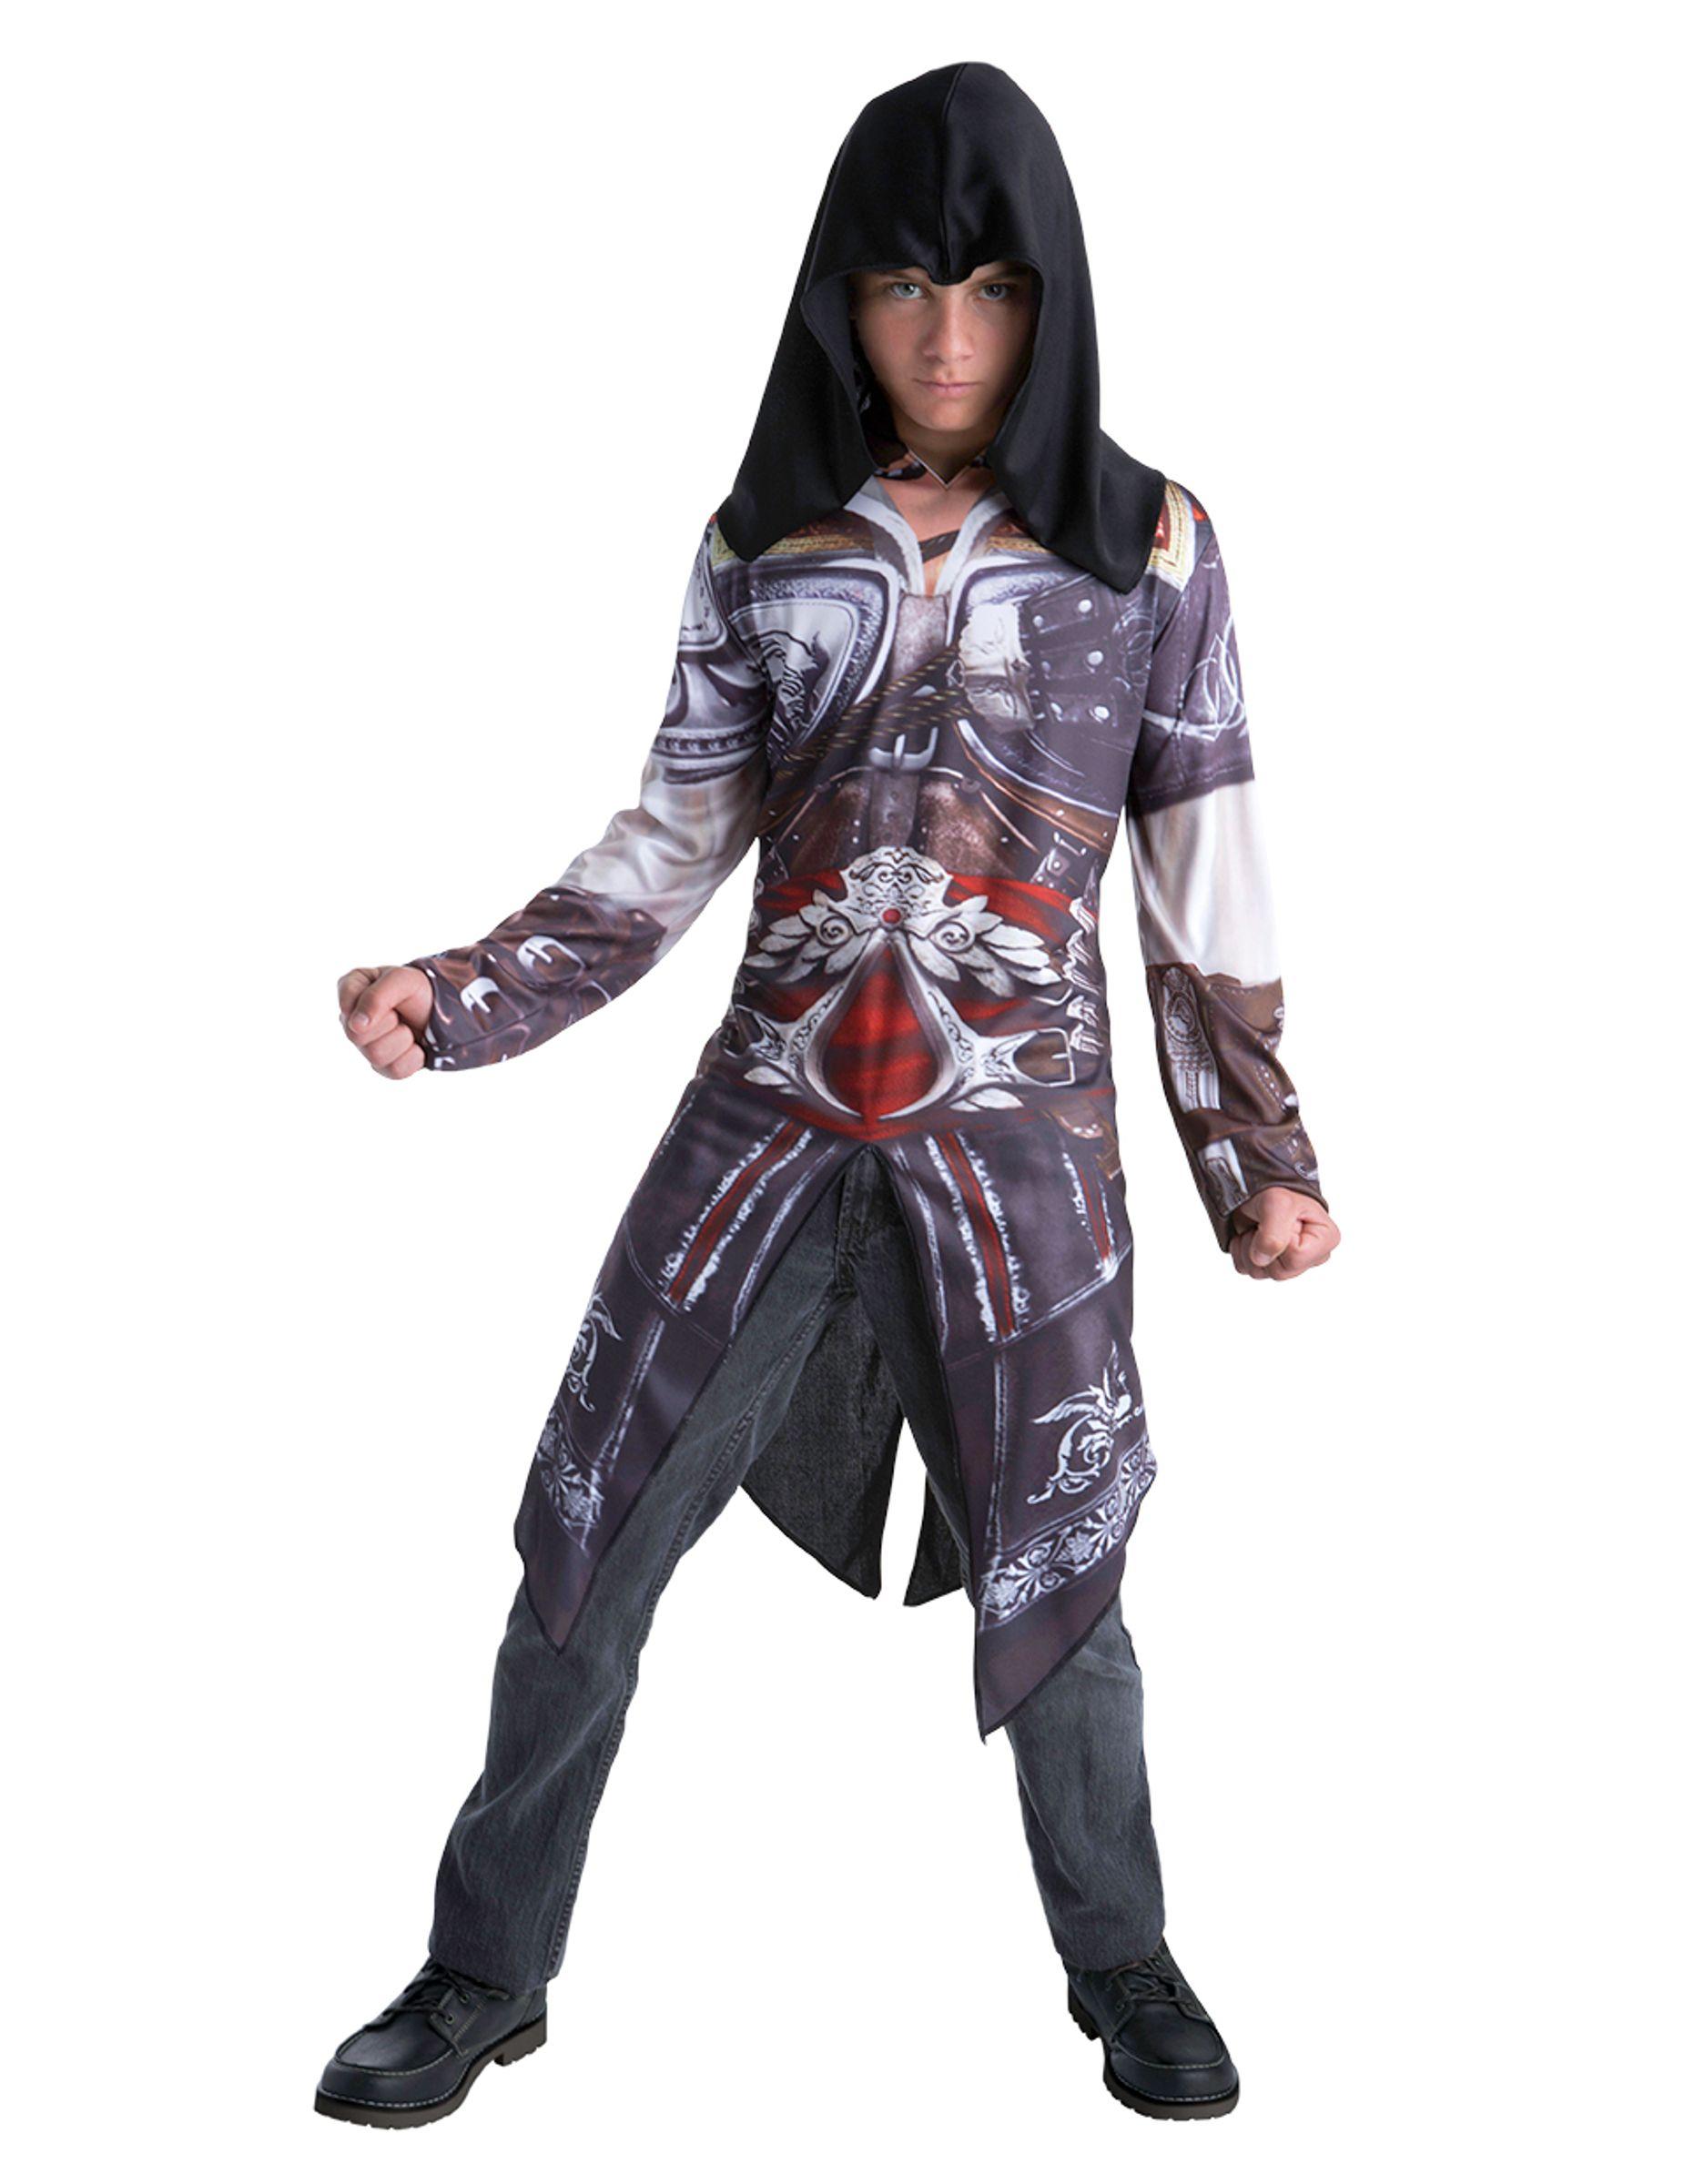 Assassin's Disfraz Adolescente Creed™ Ezio Sublimation rhdQtsCxB